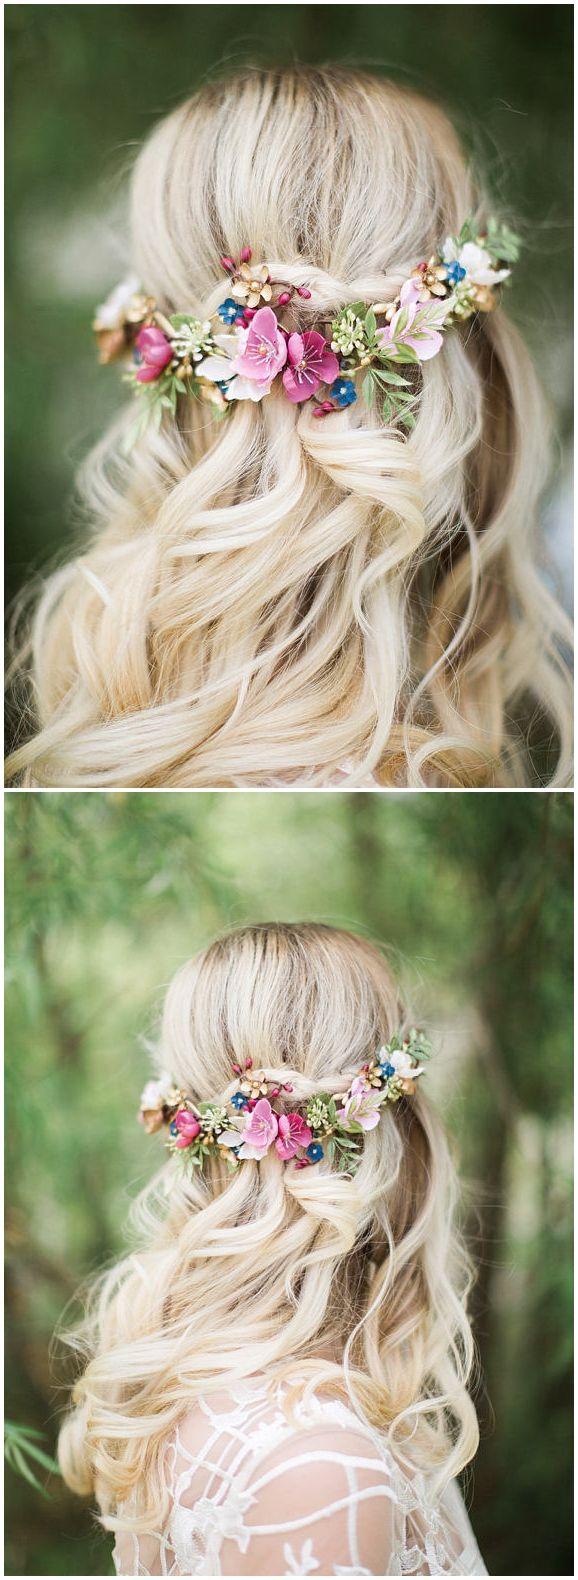 bridal hair clip, bridal headpiece, floral hair vine, dusty mauve hair piece, pink hair clip, gold, navy hair flower, burgundy hair flower #weddings #weddinghairstyles